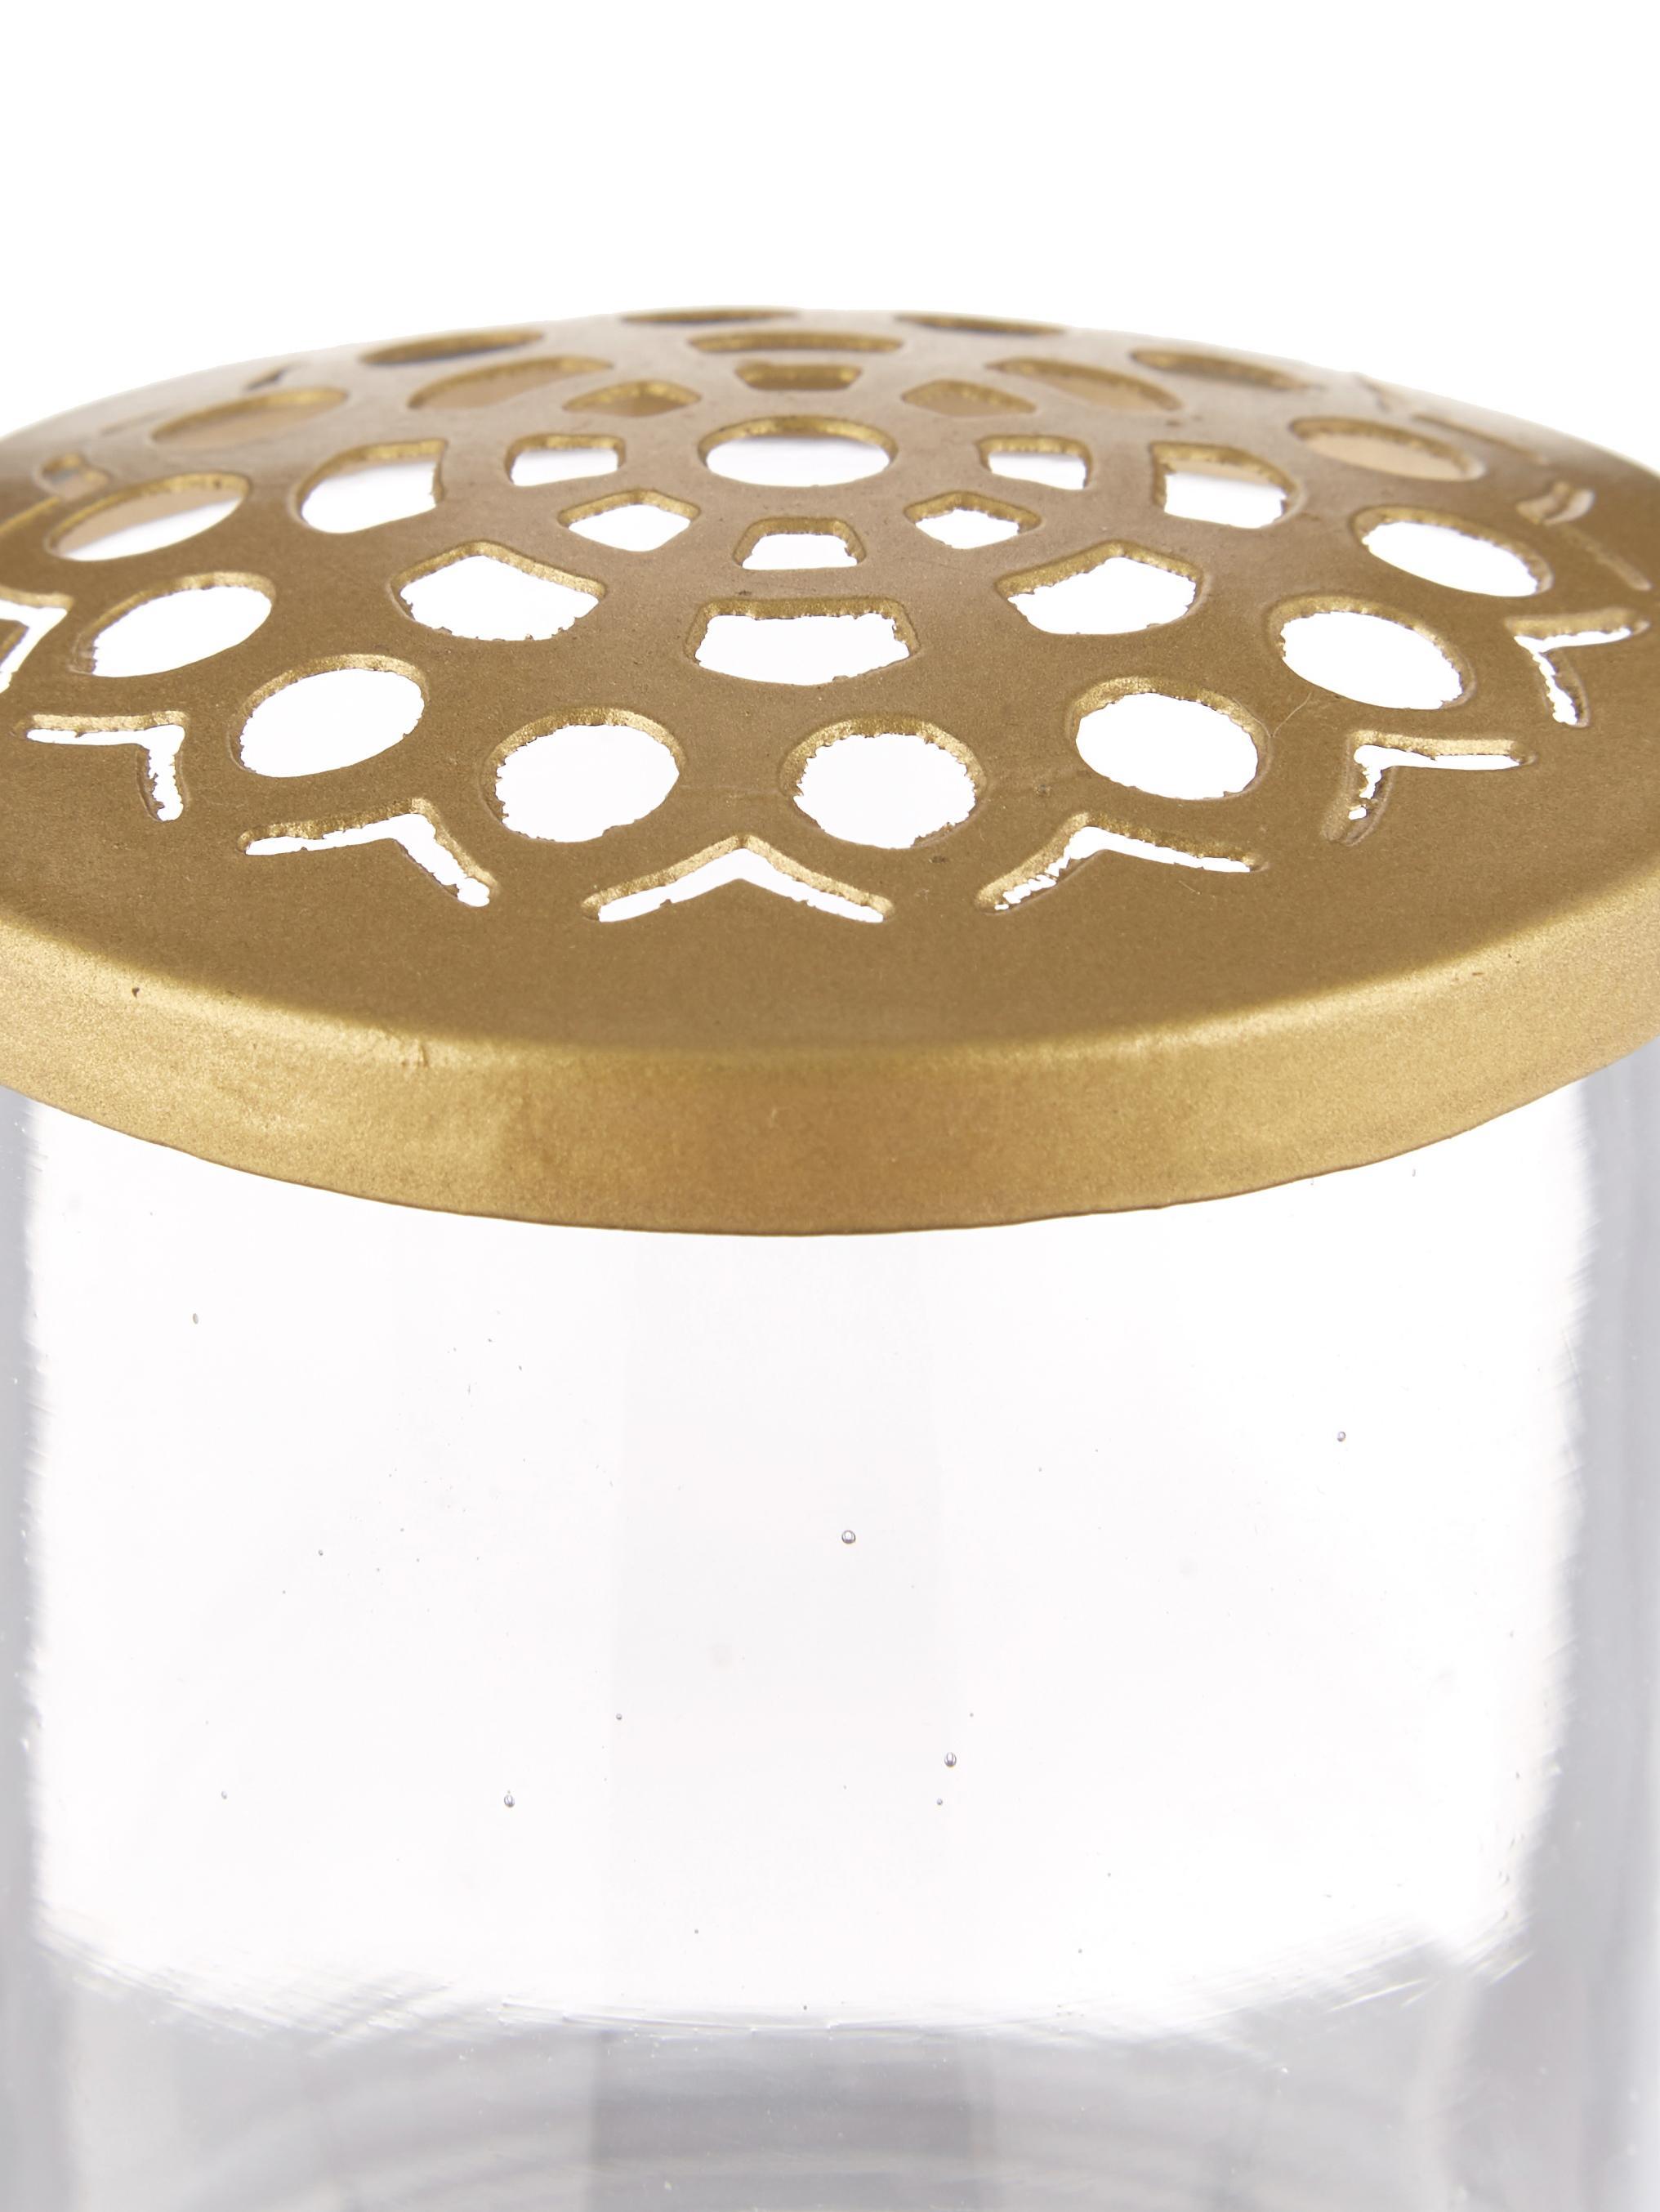 XS-vazenset Kastanje met metalen deksel, 2-delig, Vaas: glas, Deksel: vermessingd edelstaal met, Vaas: transparant. Deksel: messingkleurig, Verschillende formaten